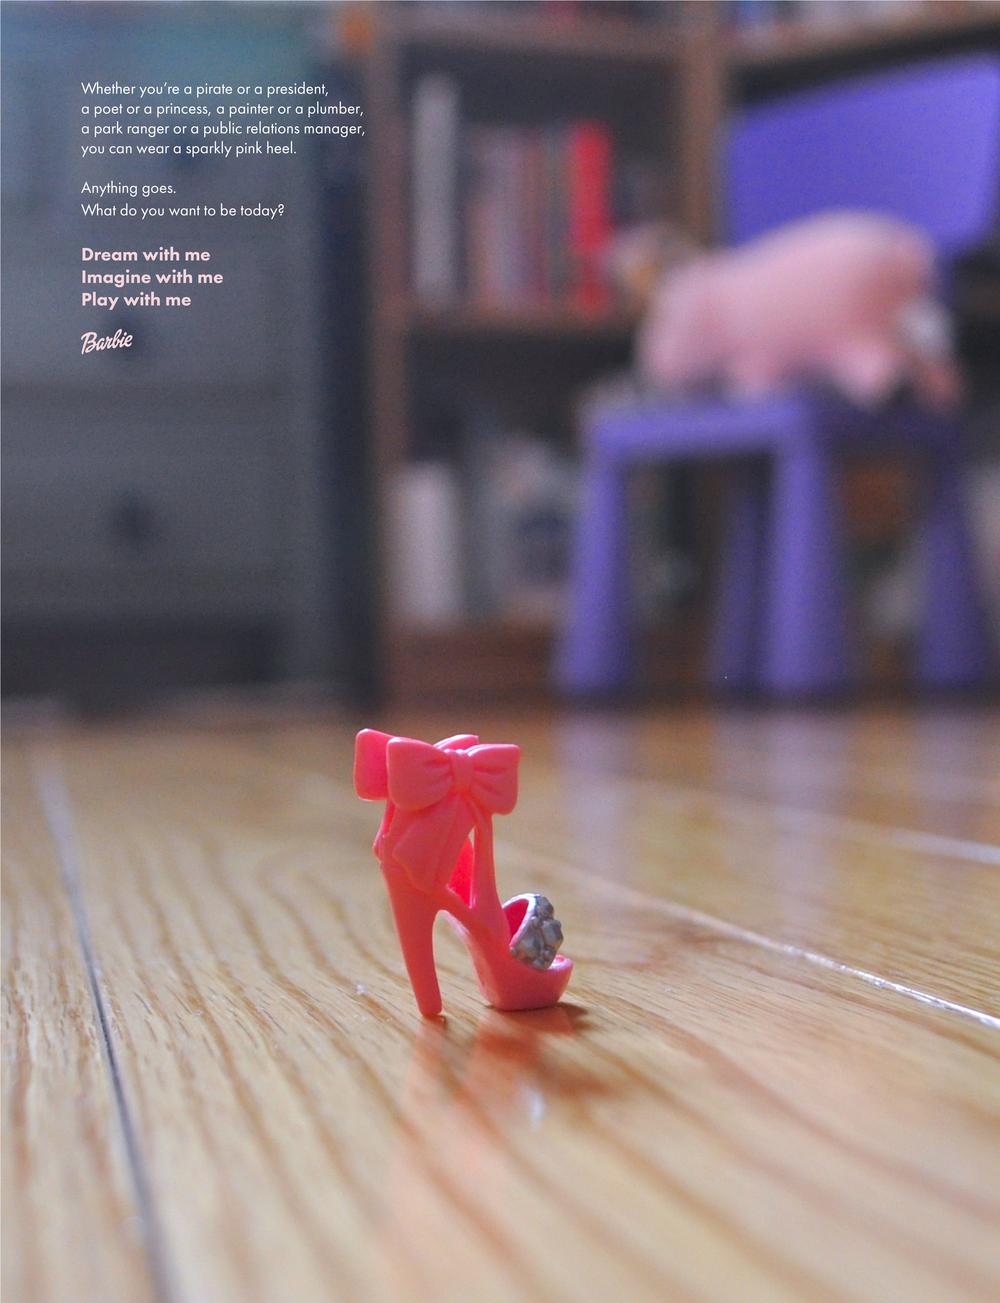 Barbe+Print+Ad+(Pink)3.png